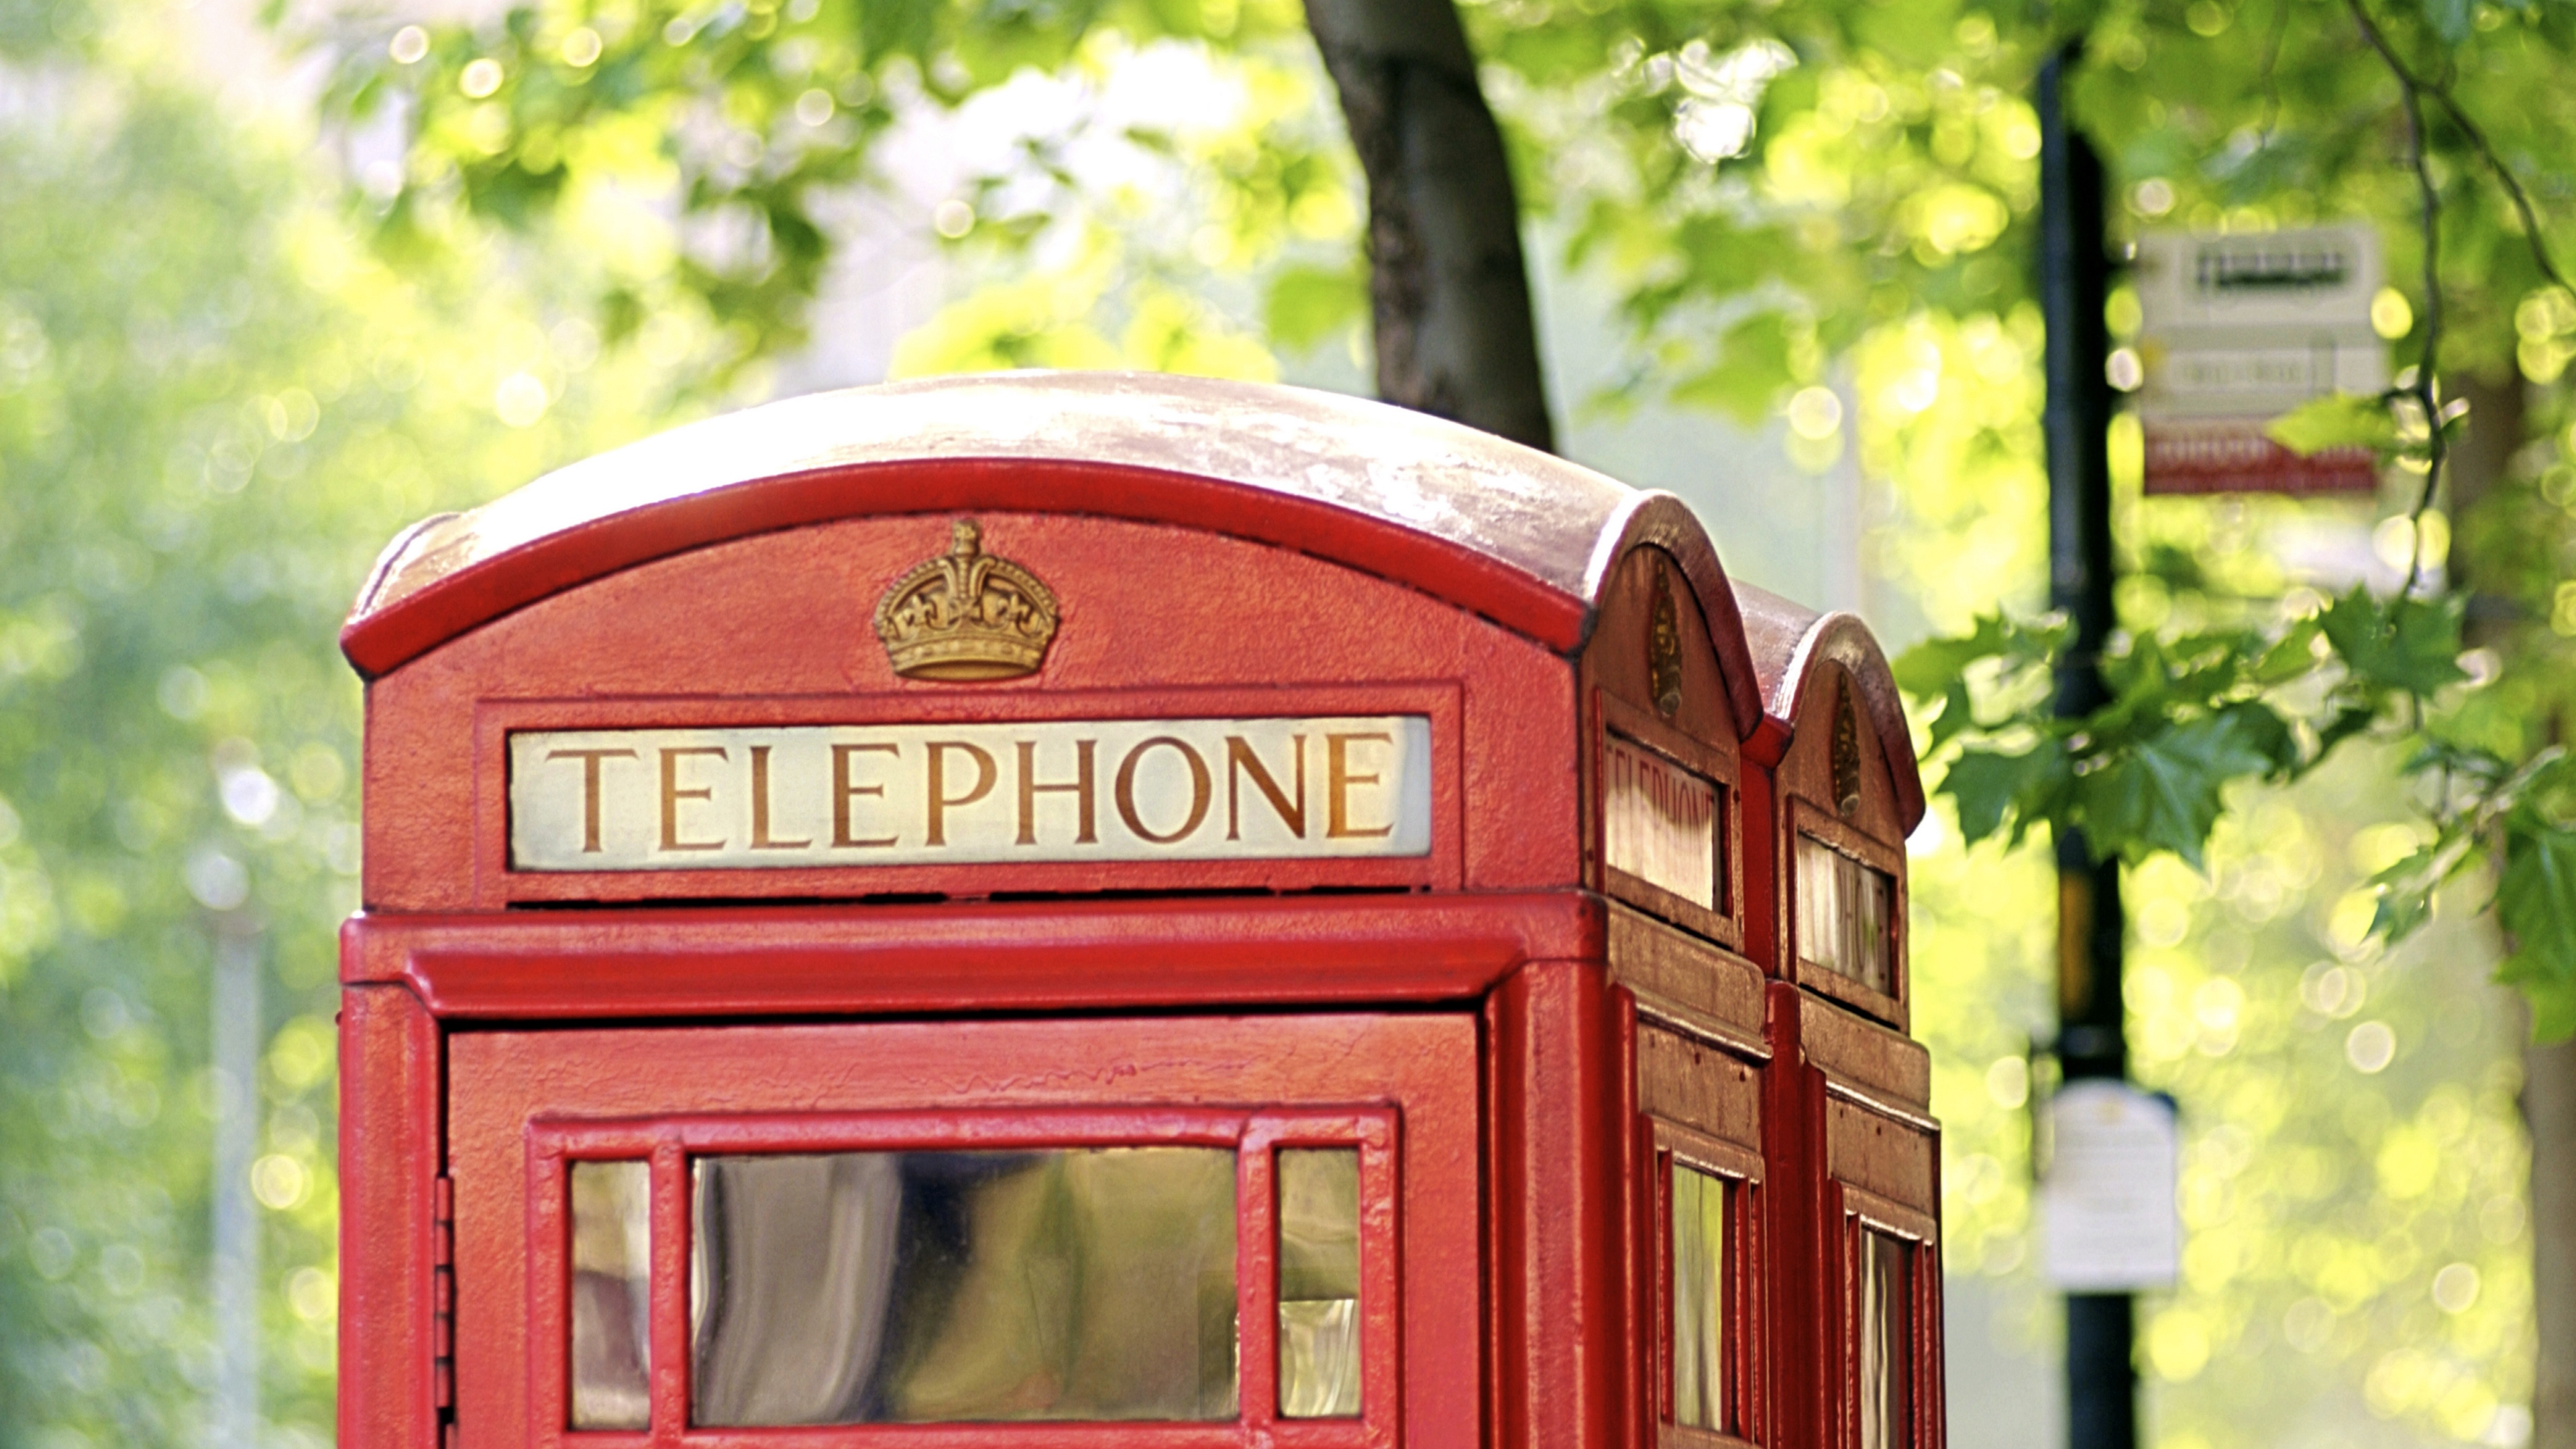 london telephone booth england city trees 4k 1538067628 - london, telephone booth, england, city, trees 4k - telephone booth, London, England